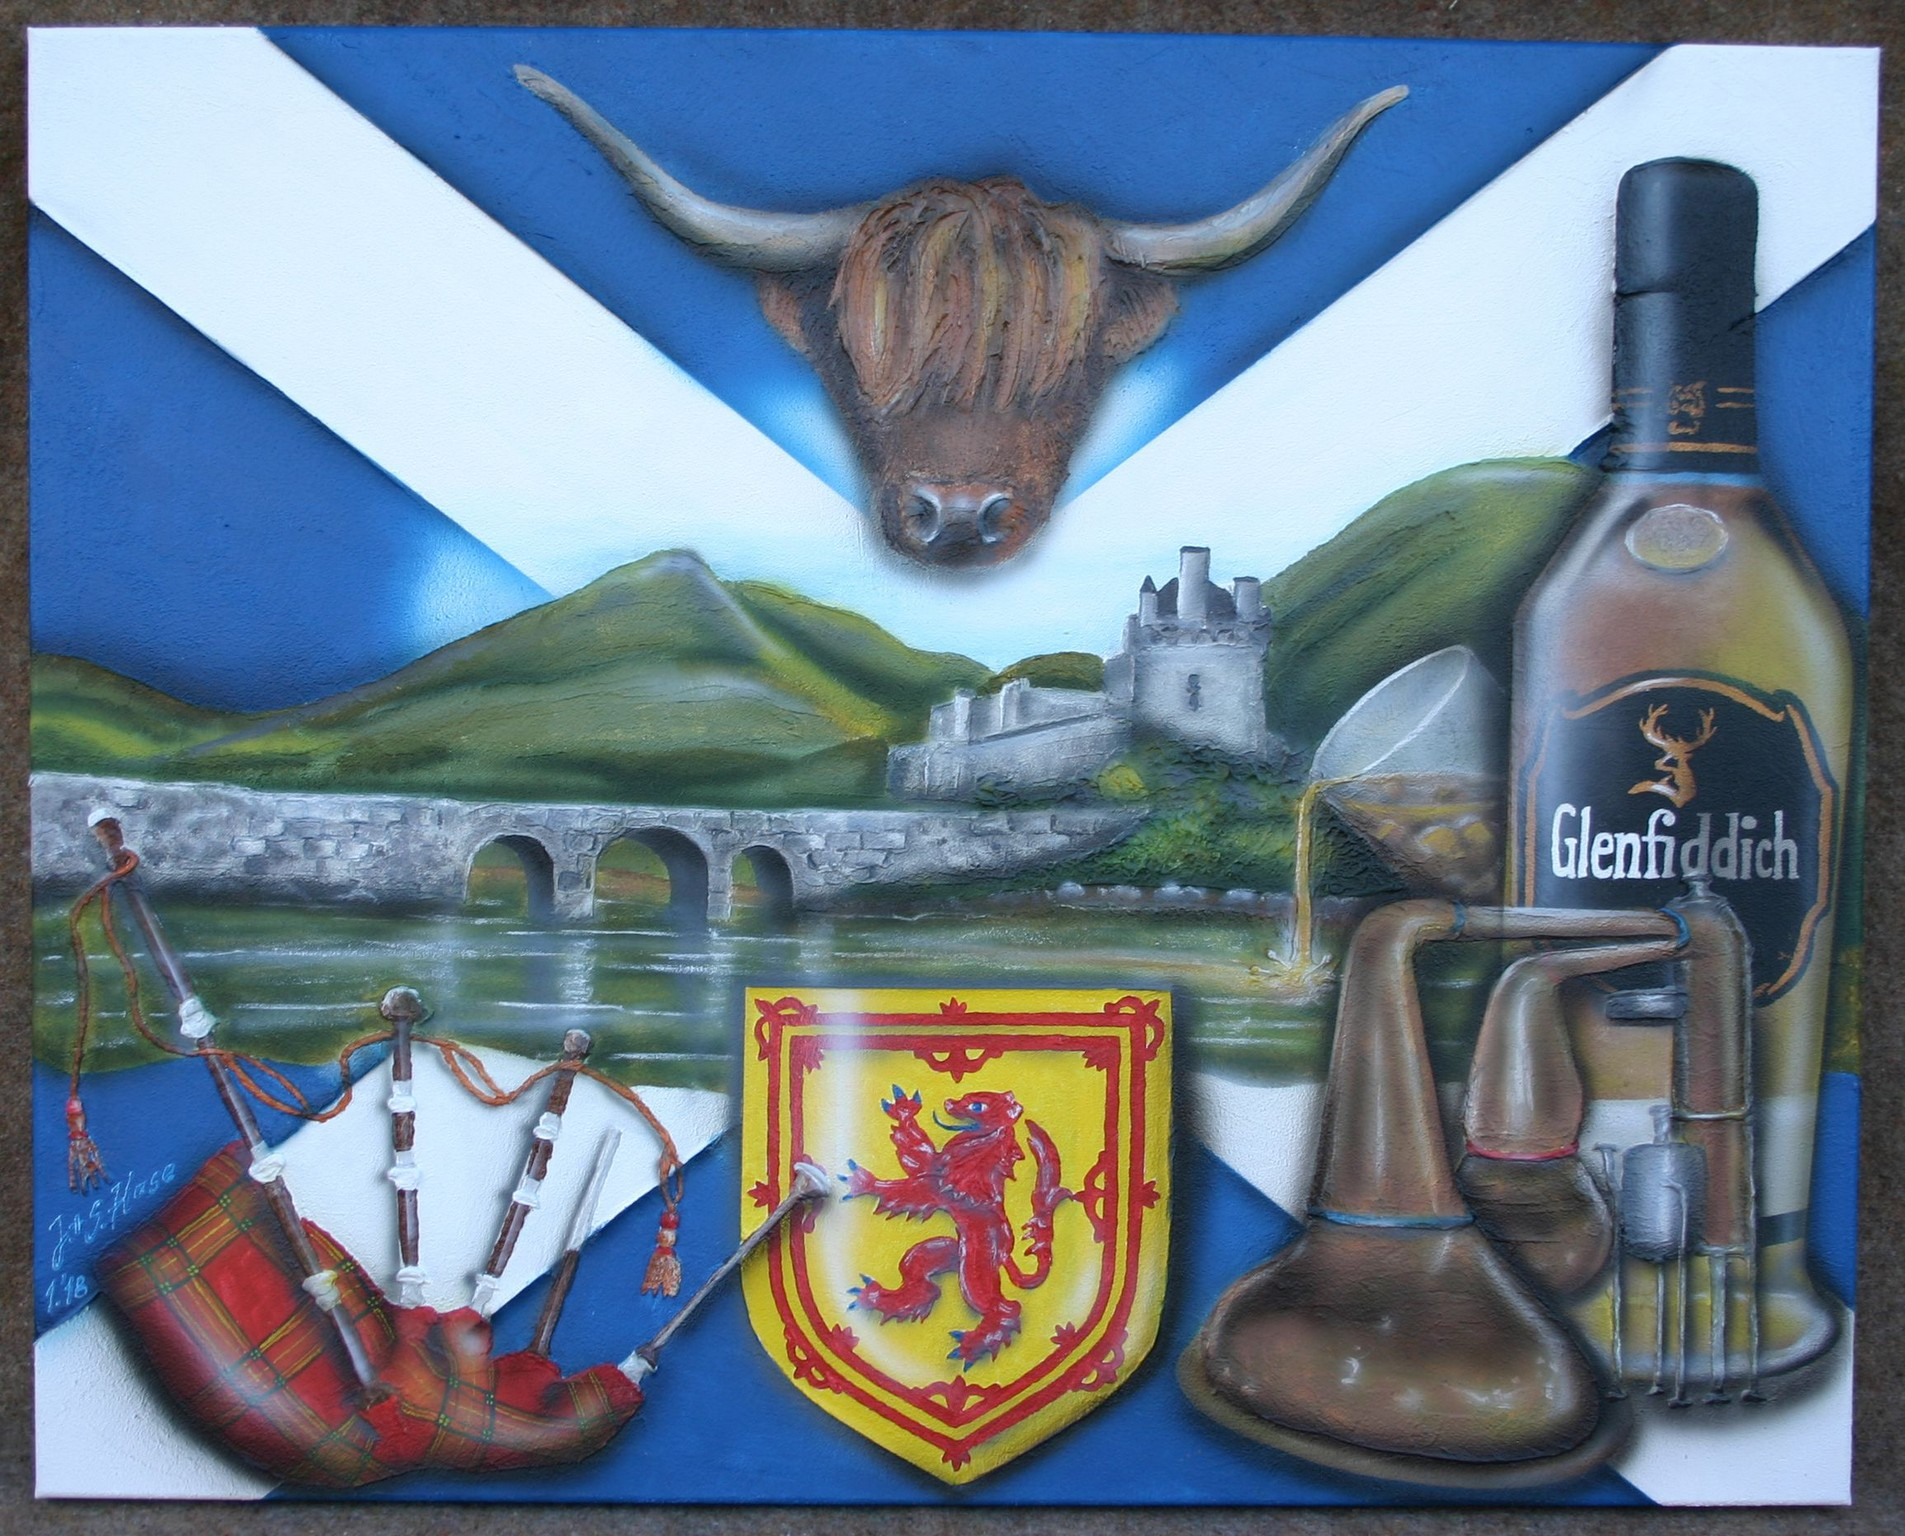 Scotland-the-Brave